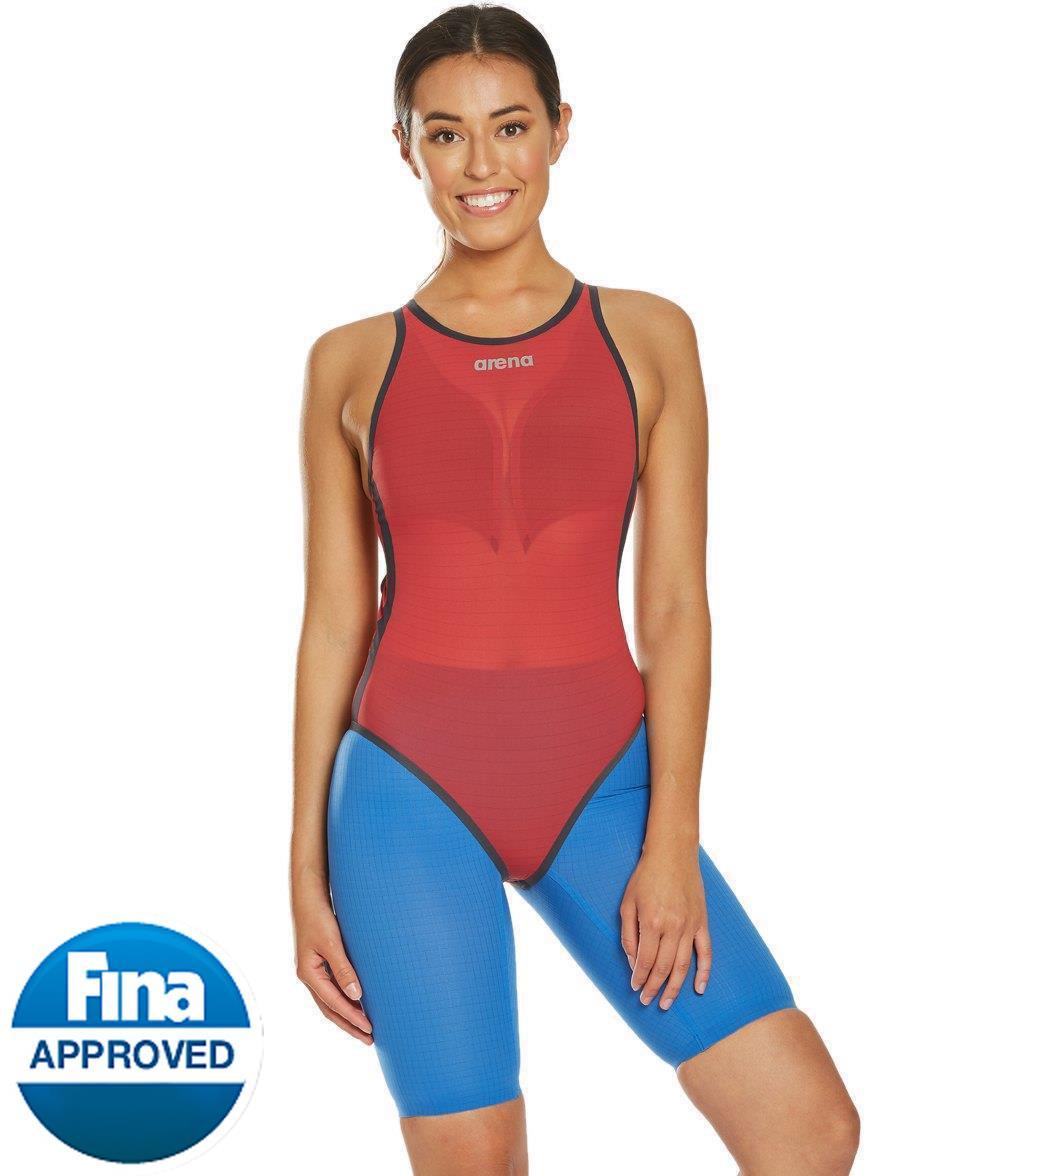 Arena Women's Powerskin Carbon Duo Tech Suit Swimsuit Top